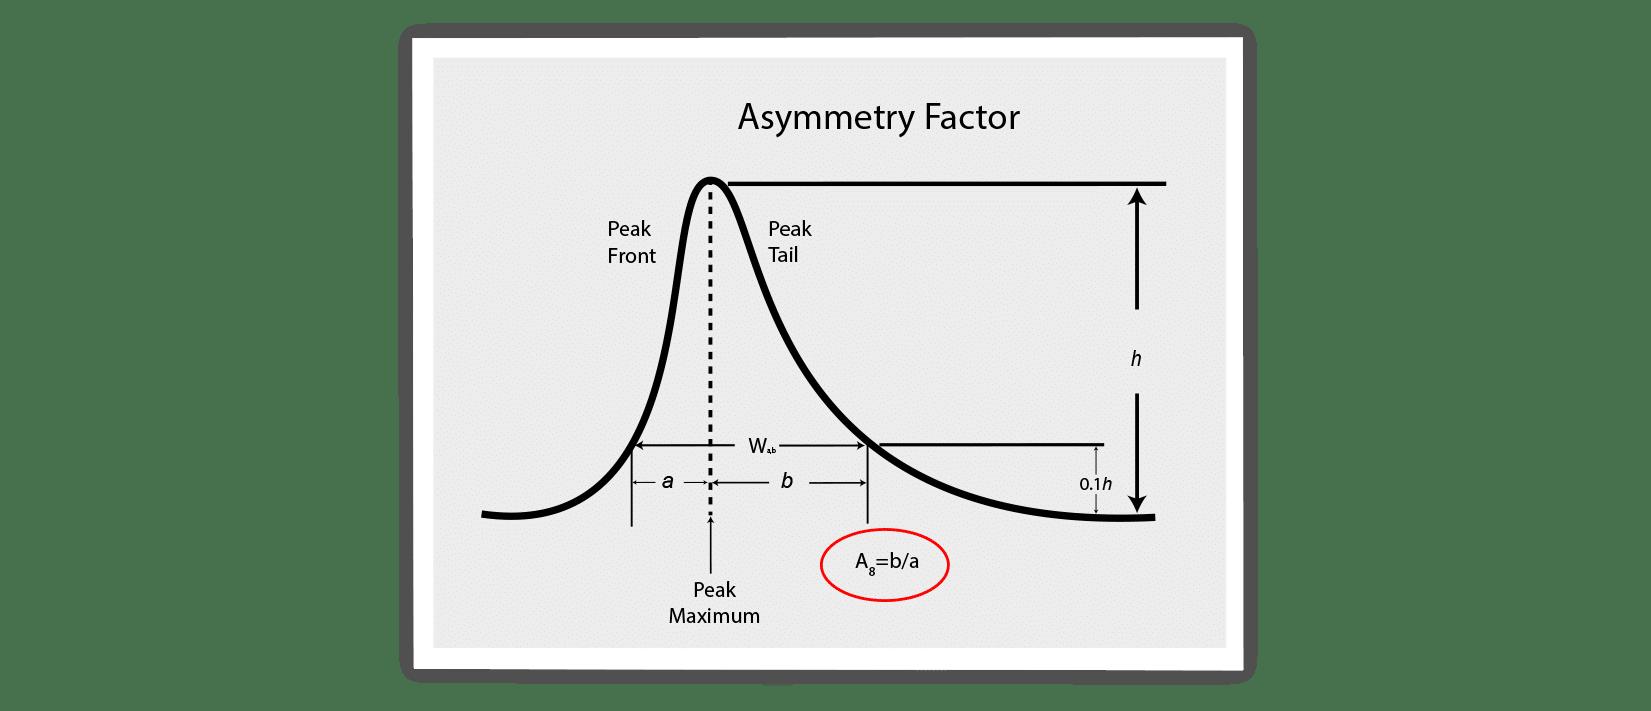 chromatography, peak shapes, asymmetry factor